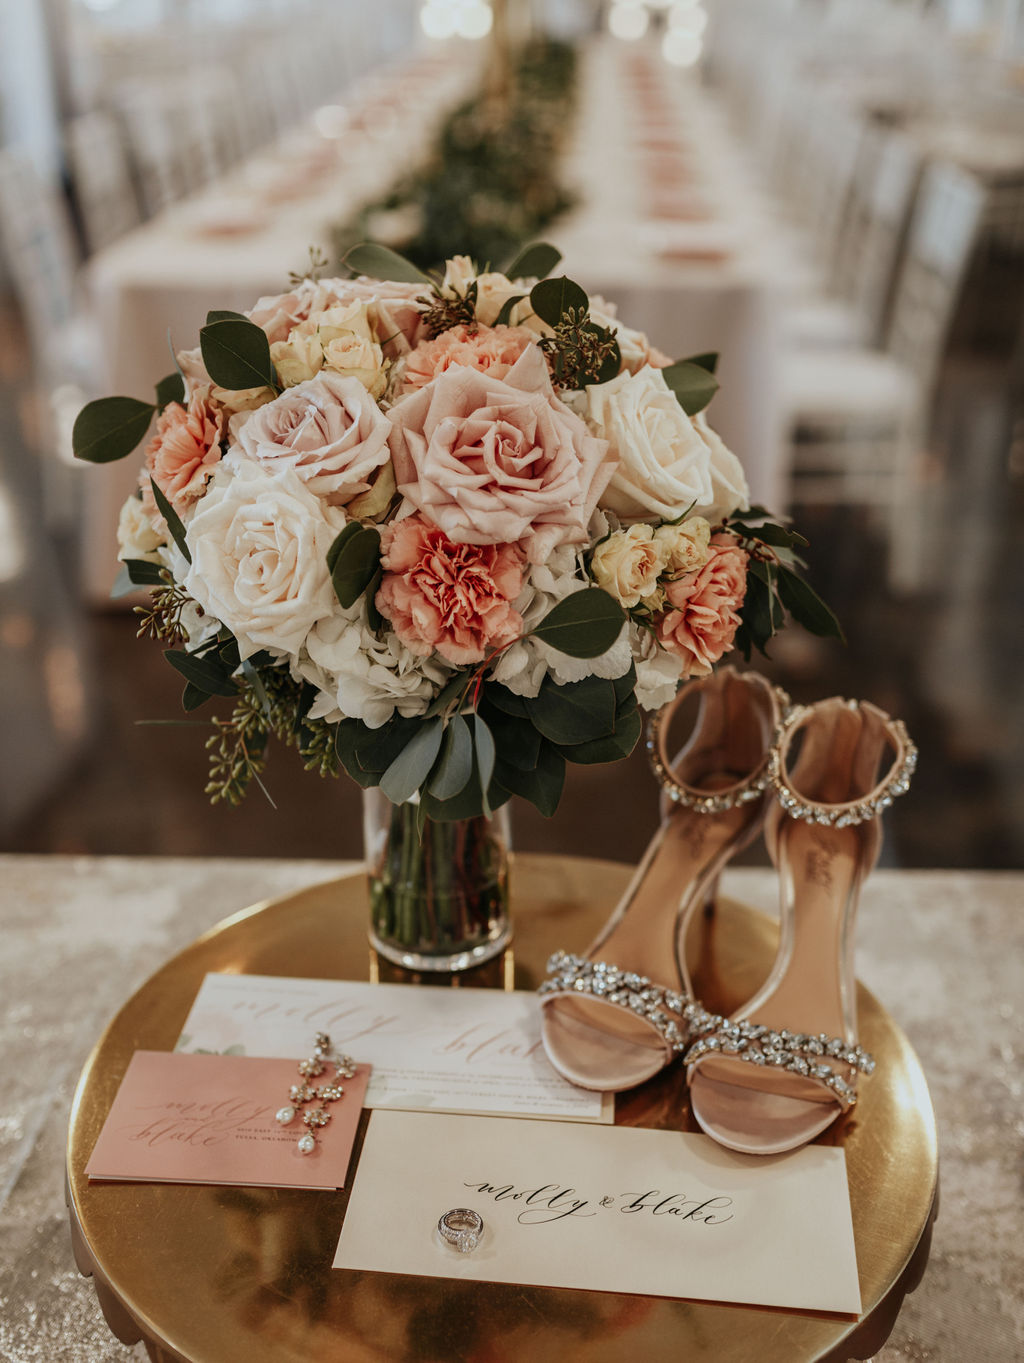 Best Oklahoma Outdoor Wedding Venue Tulsa Bixby White Barn 3.jpg